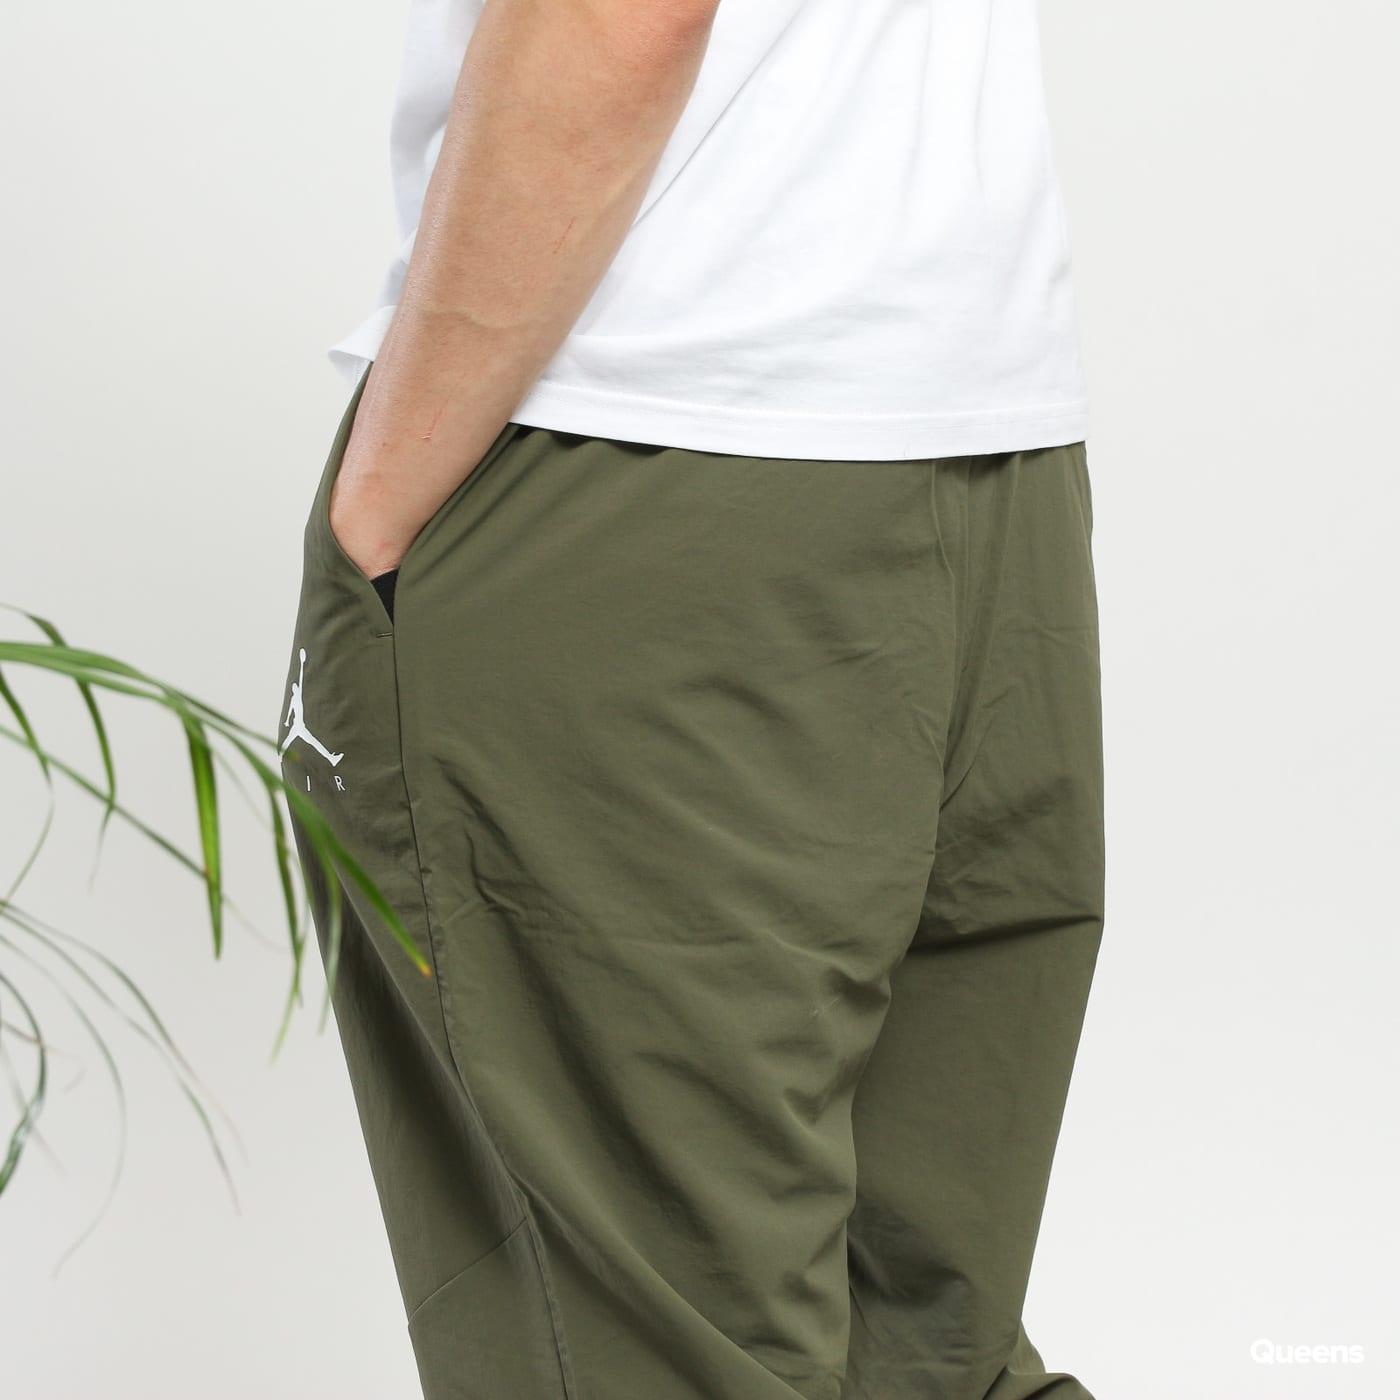 e1f19c65c85198 Zoom in Zoom in Zoom in Zoom in Zoom in Zoom in. Jordan Jumpman Woven Pant  olive